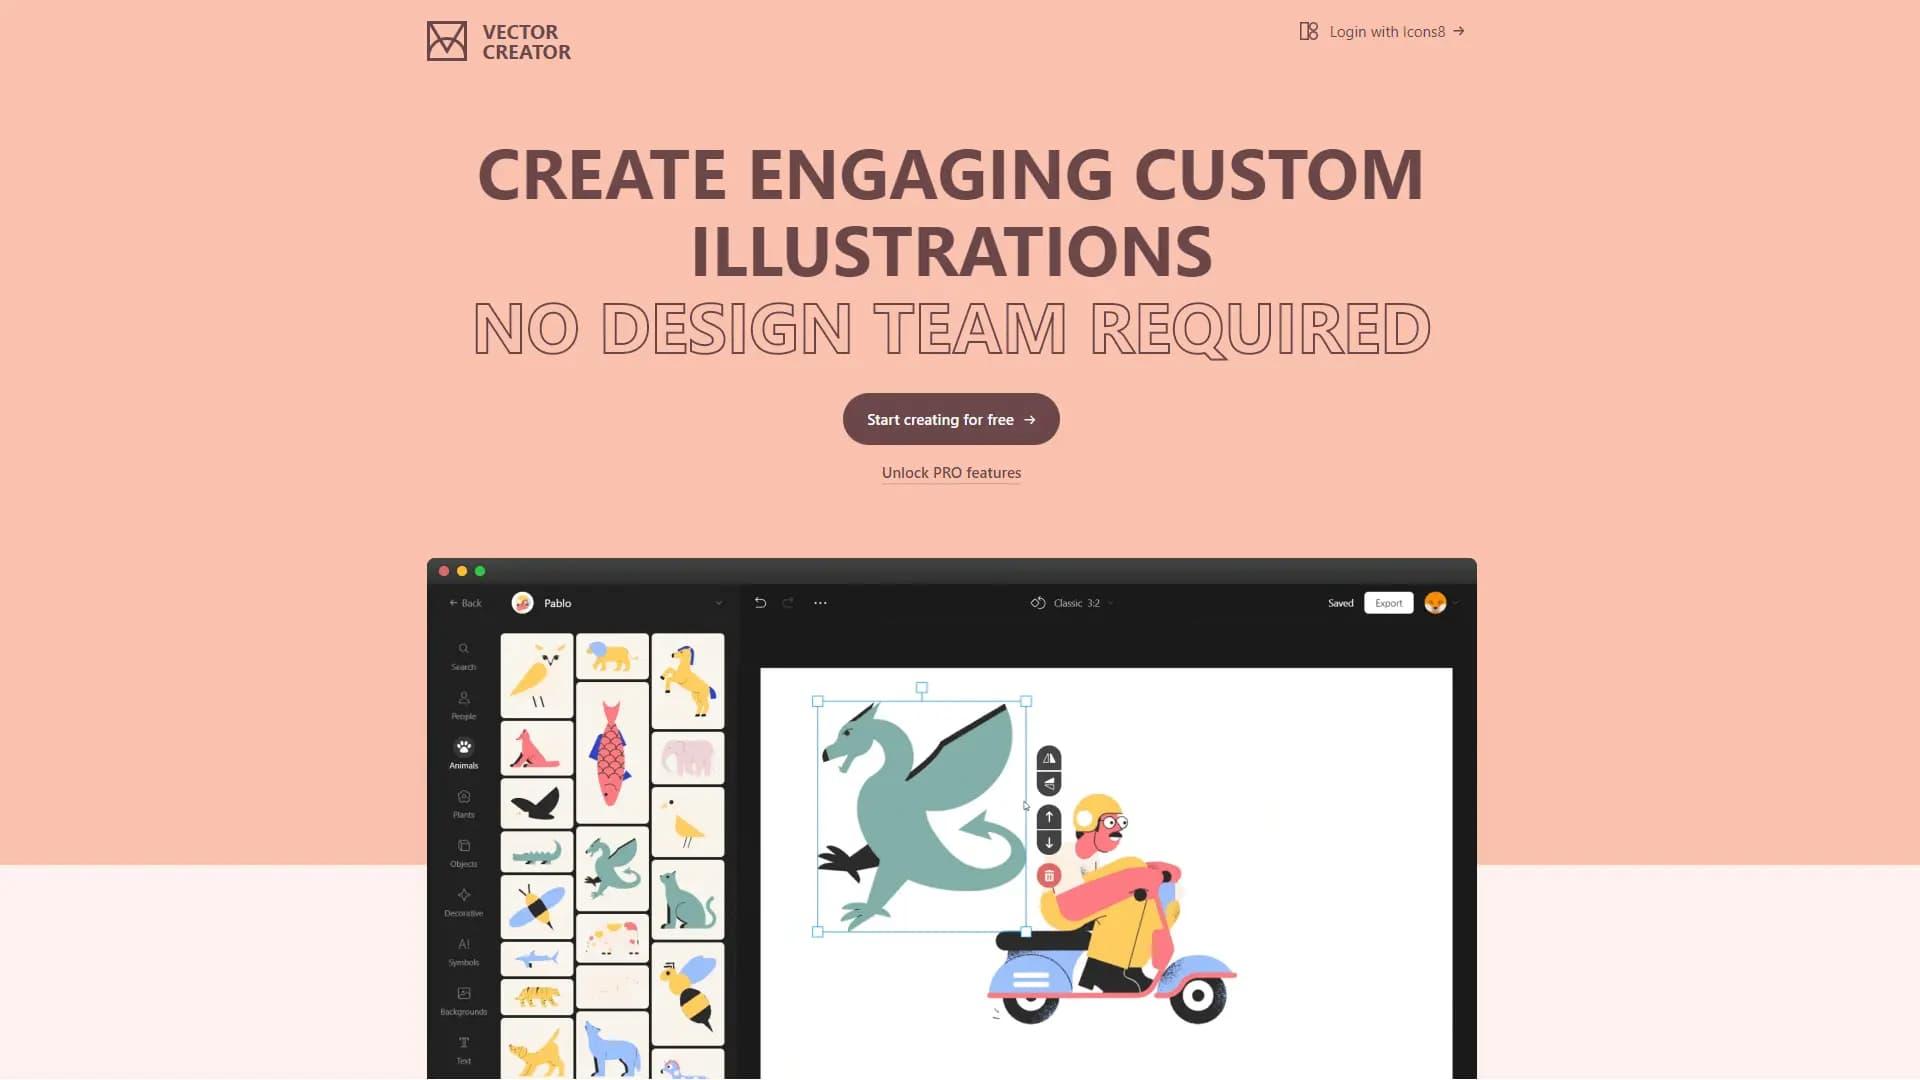 Icons8推出的在线插画设计「Vector Creator」